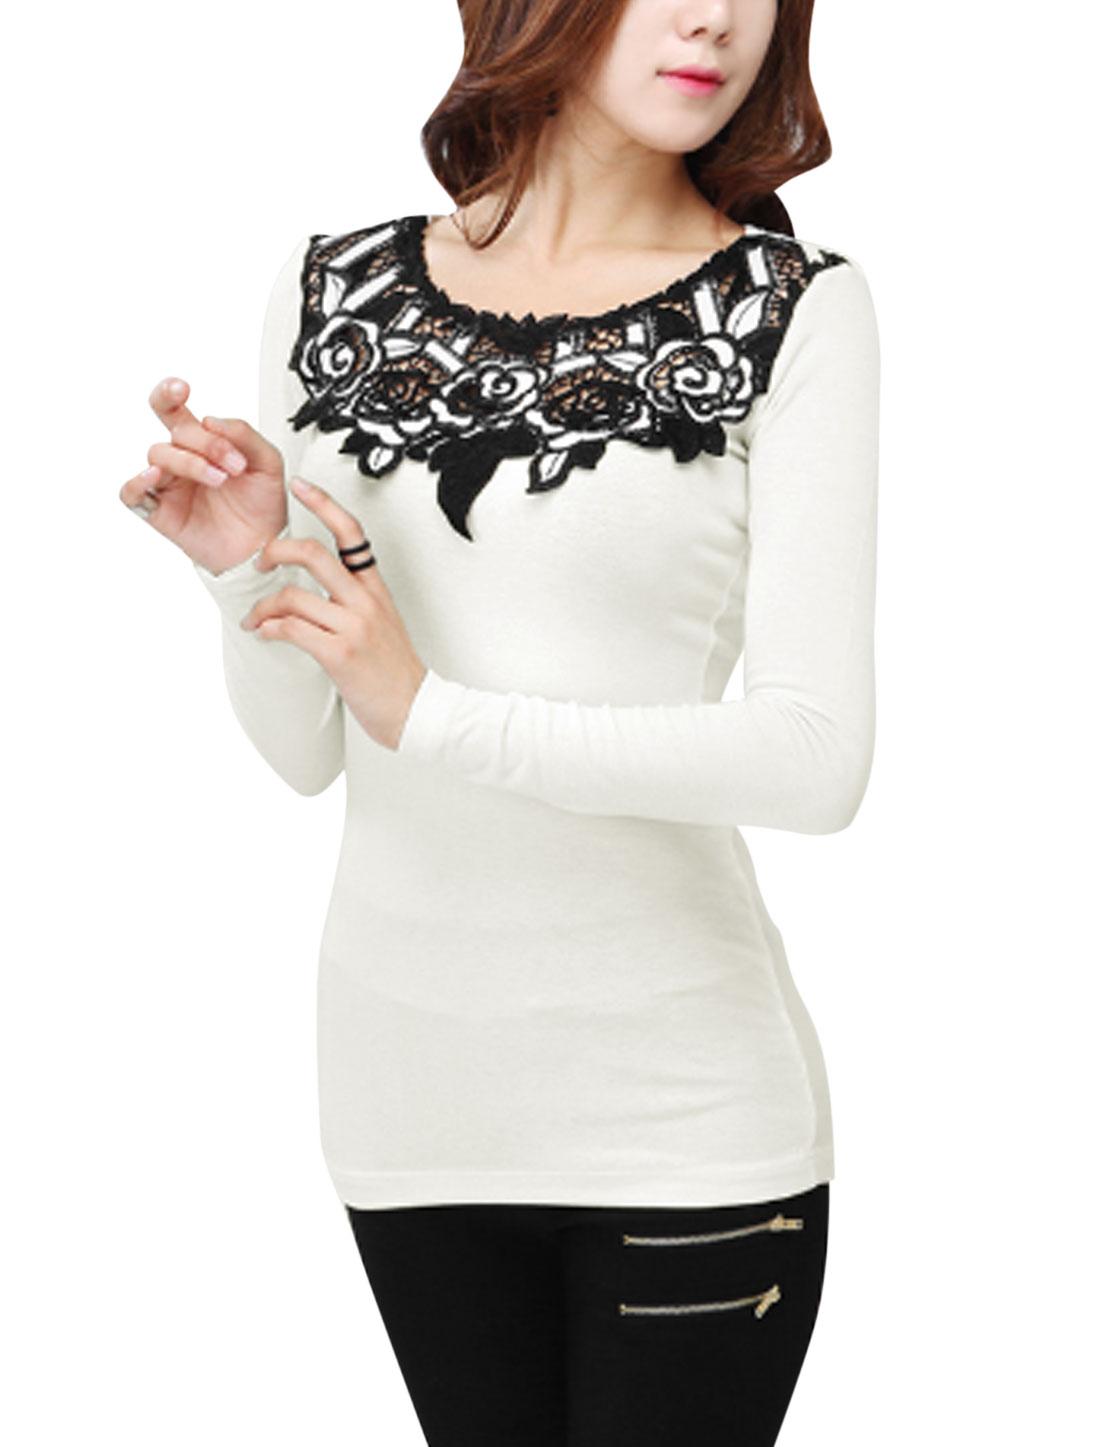 Ladies White Slipover Flower Design Splicing Slim Fit Leisure Top S